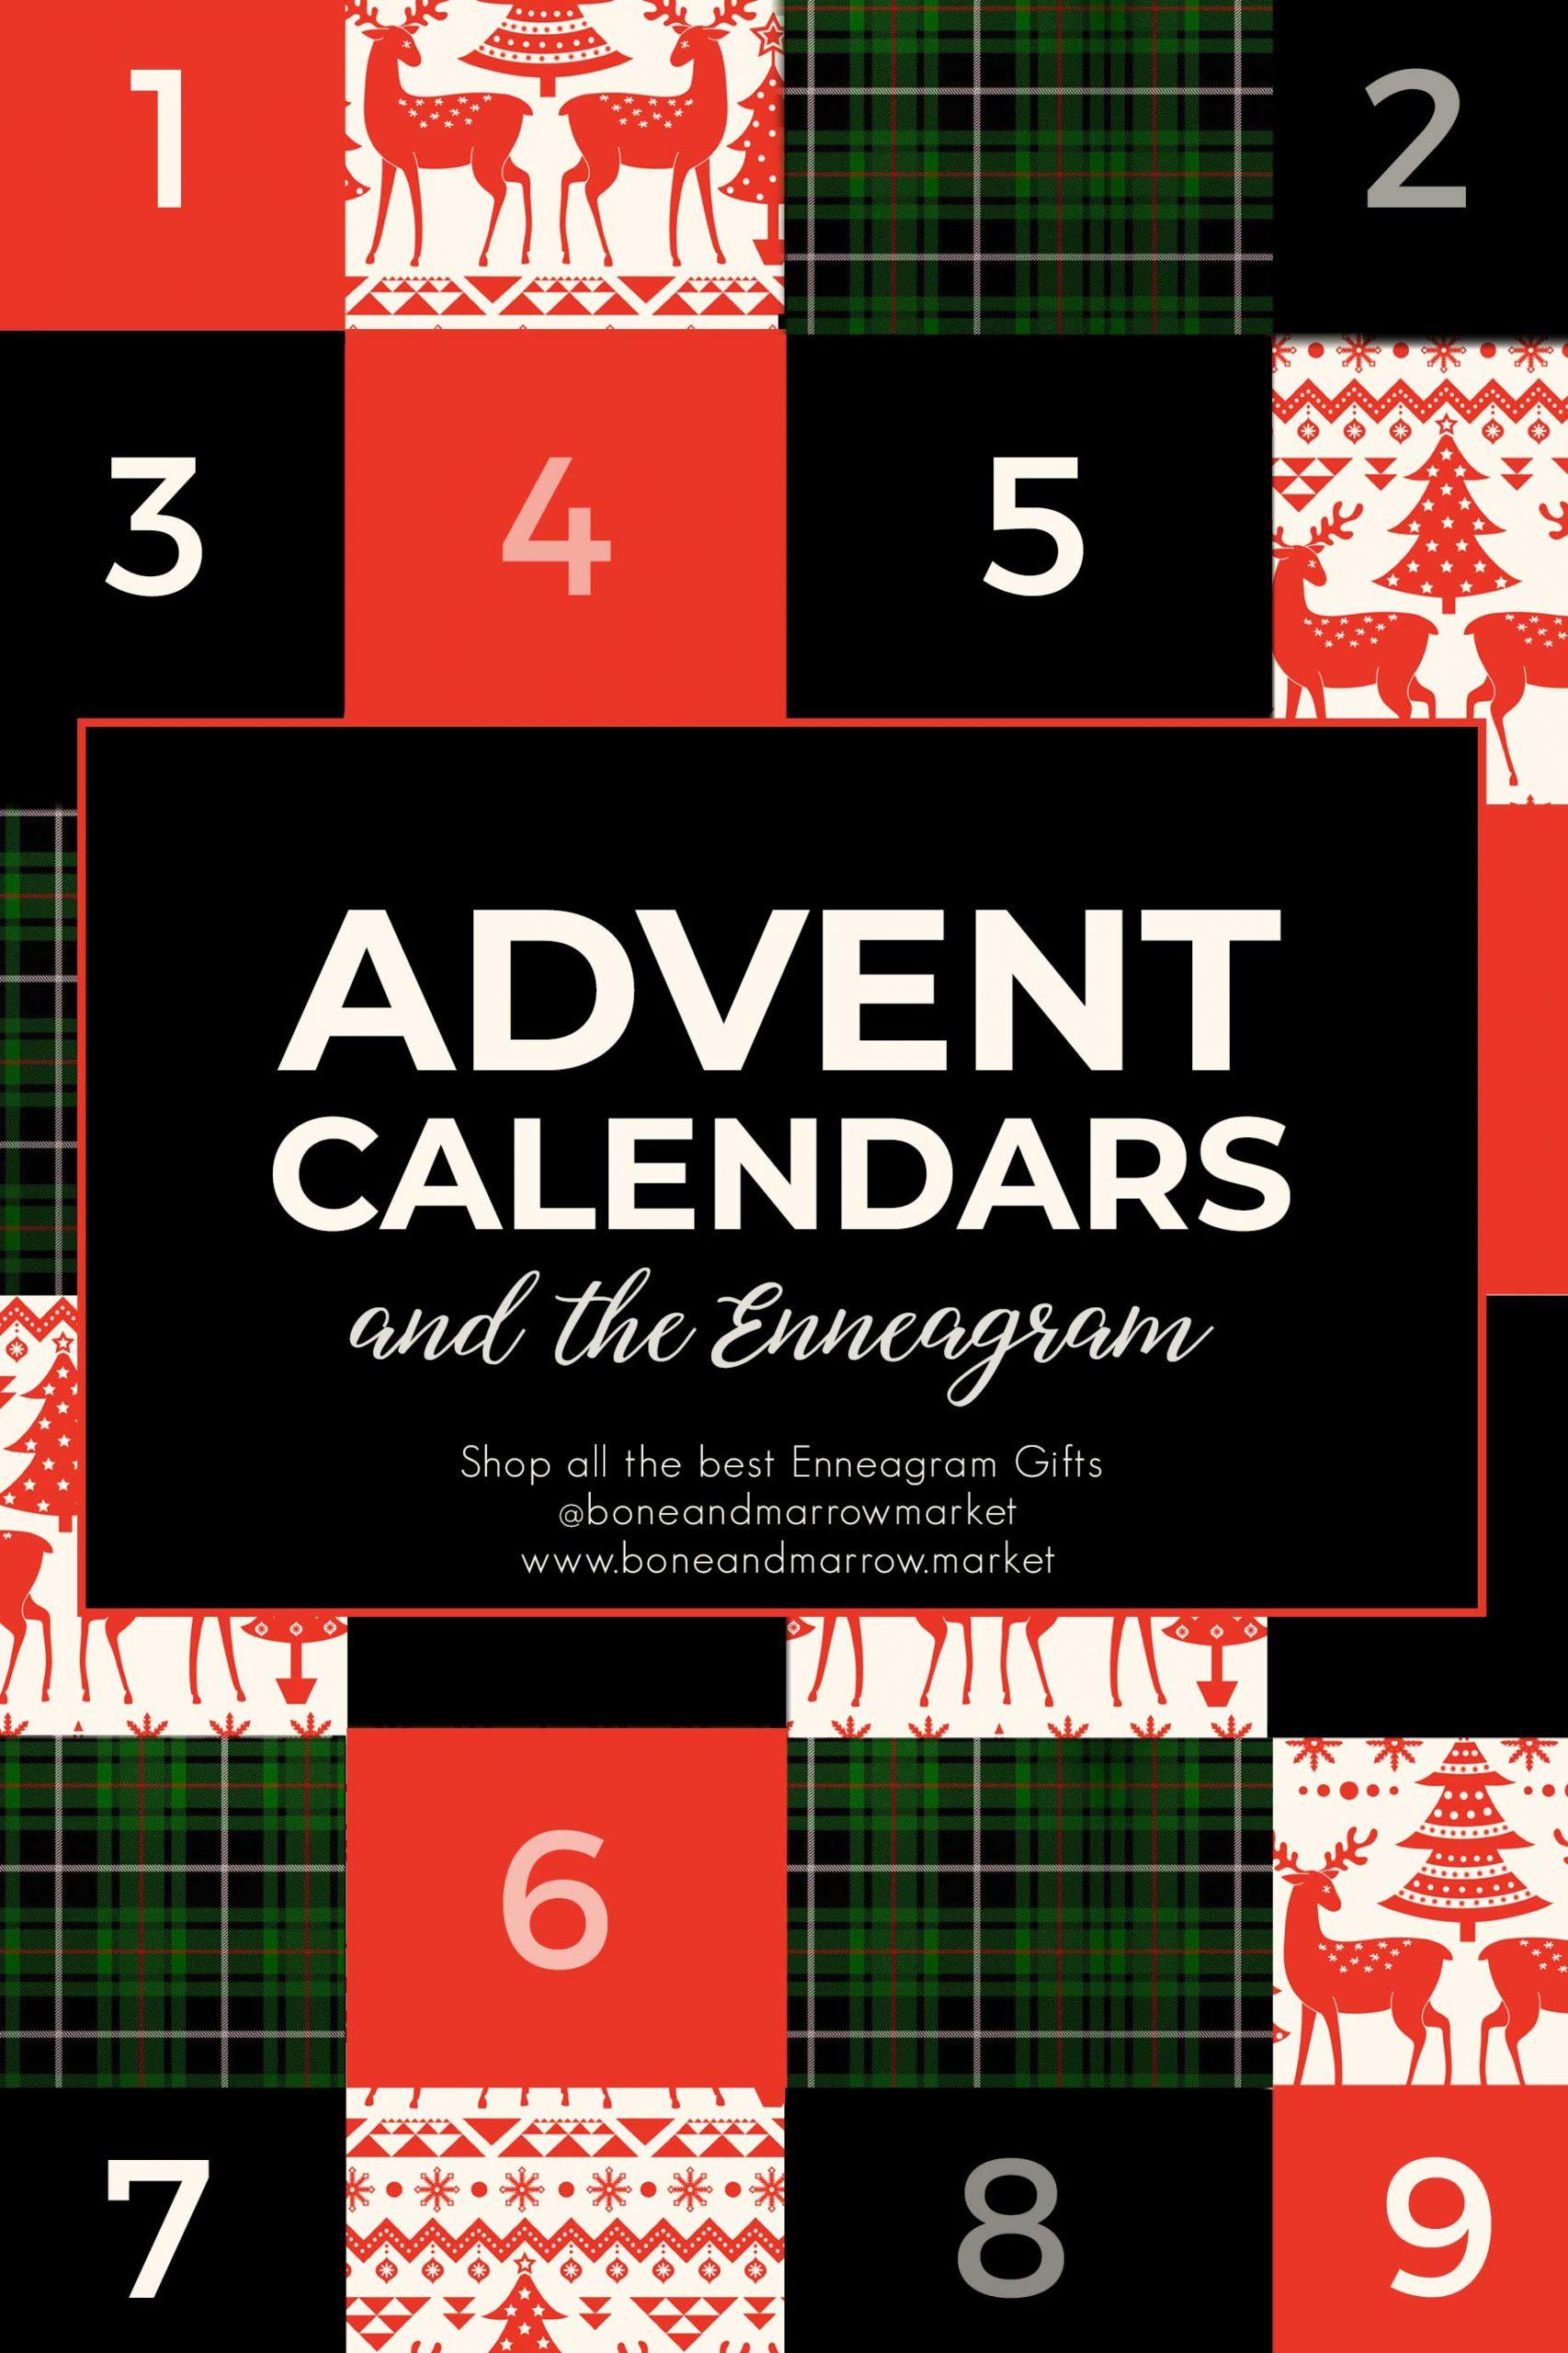 Advent Calendars by Enneagram Type